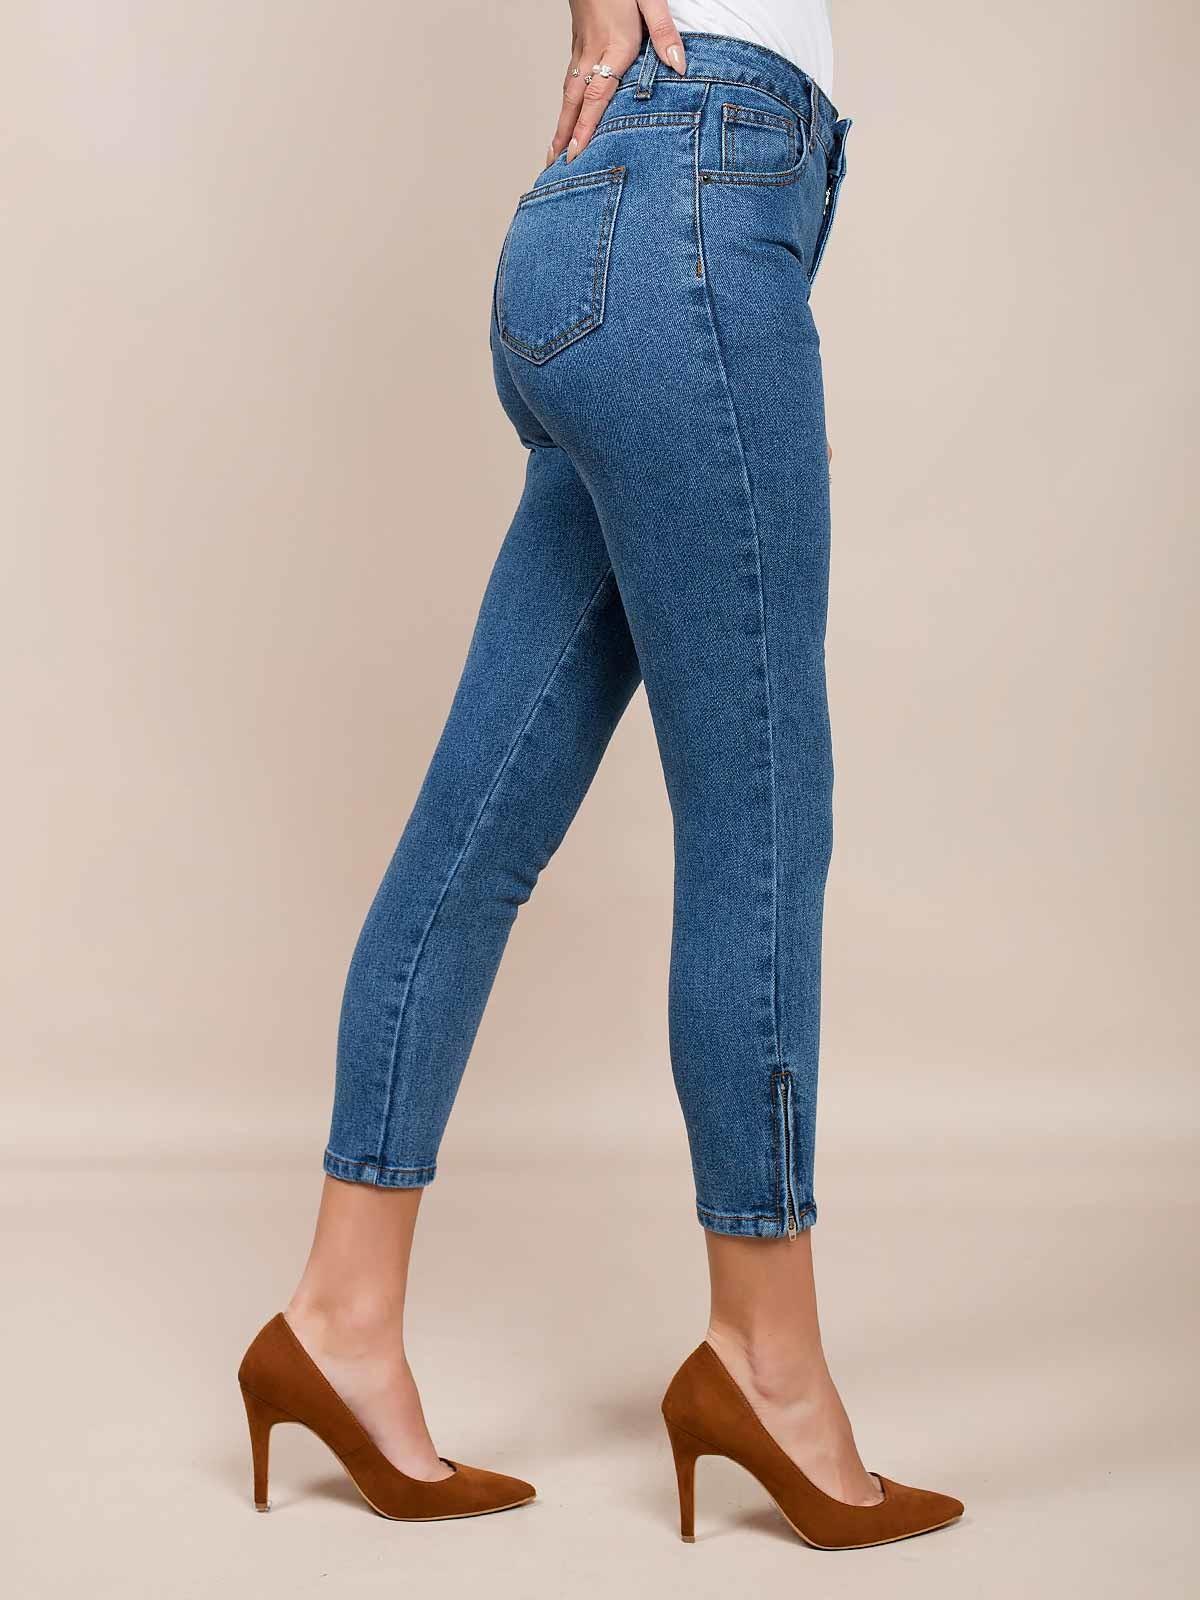 Vaqueros high waist jeans oscuro